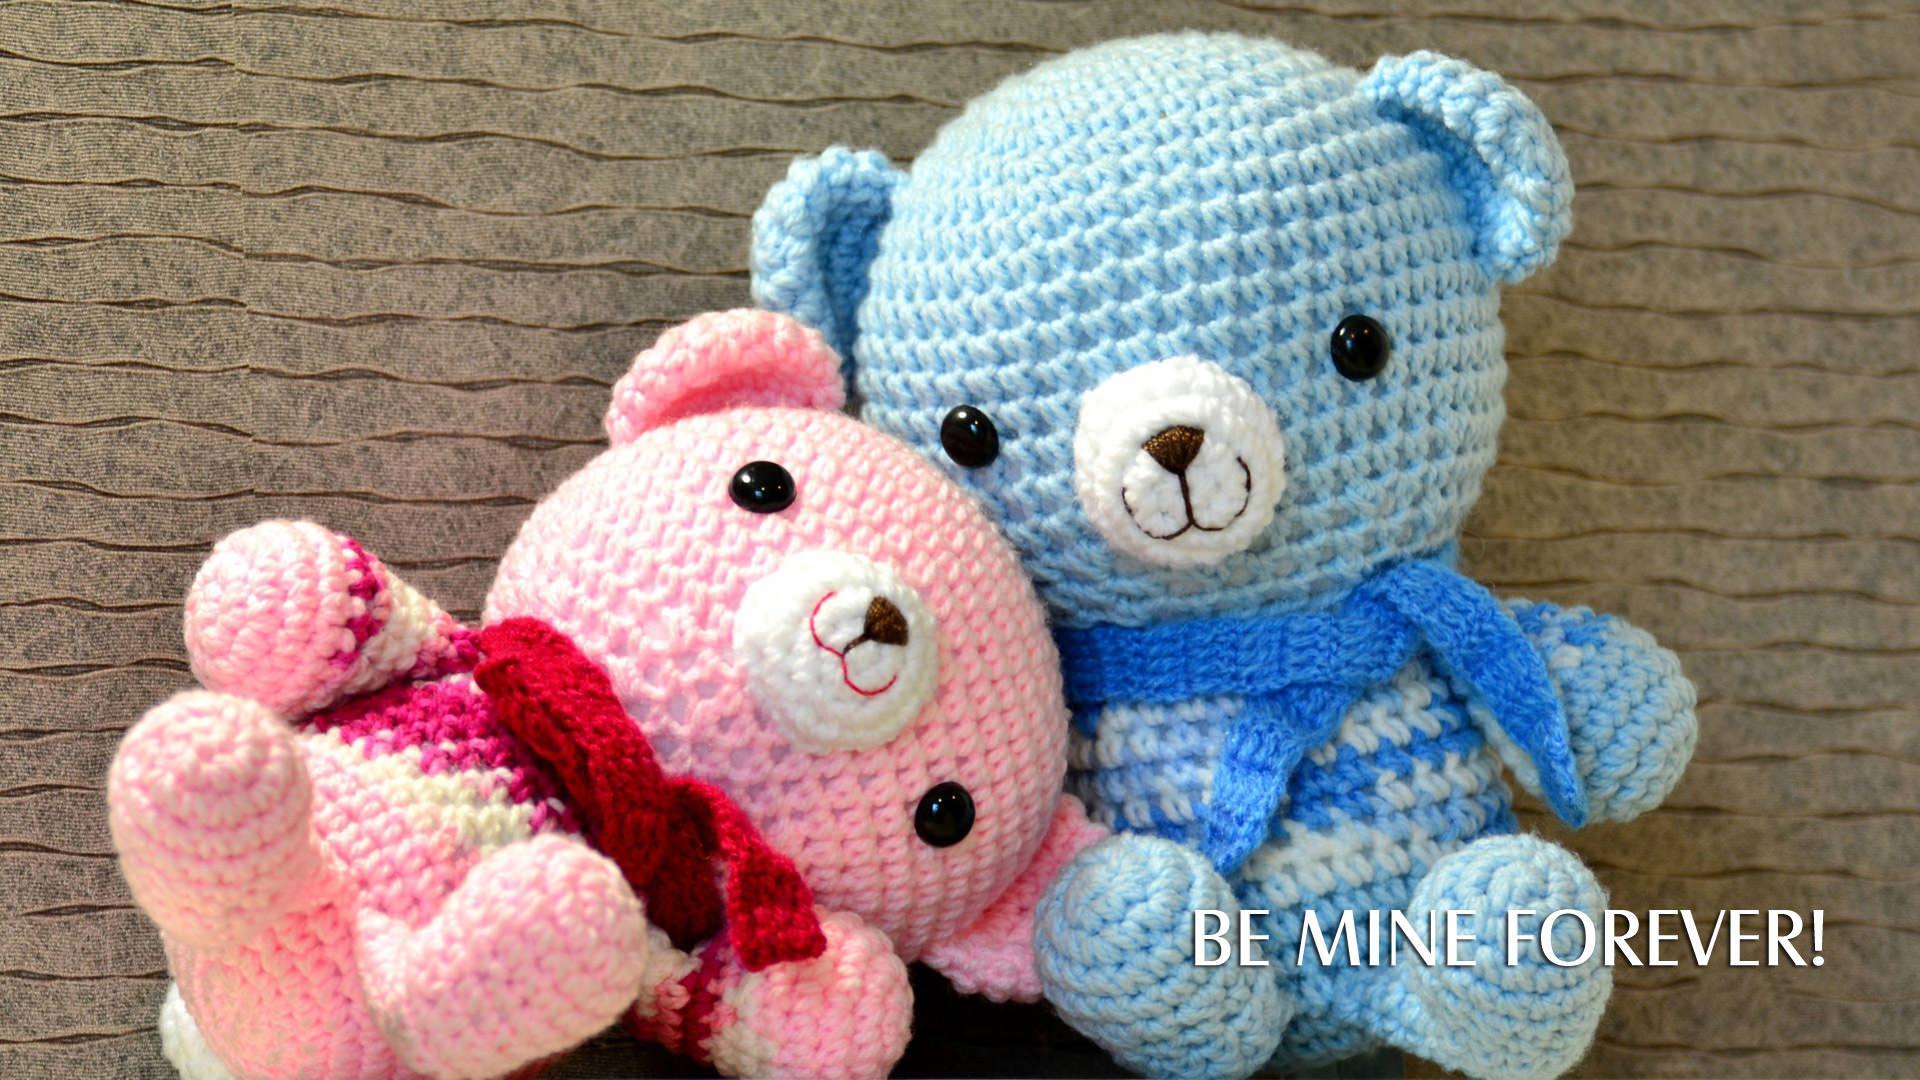 Cute Love Teddy Bear Wallpapers Wallpaper Cave